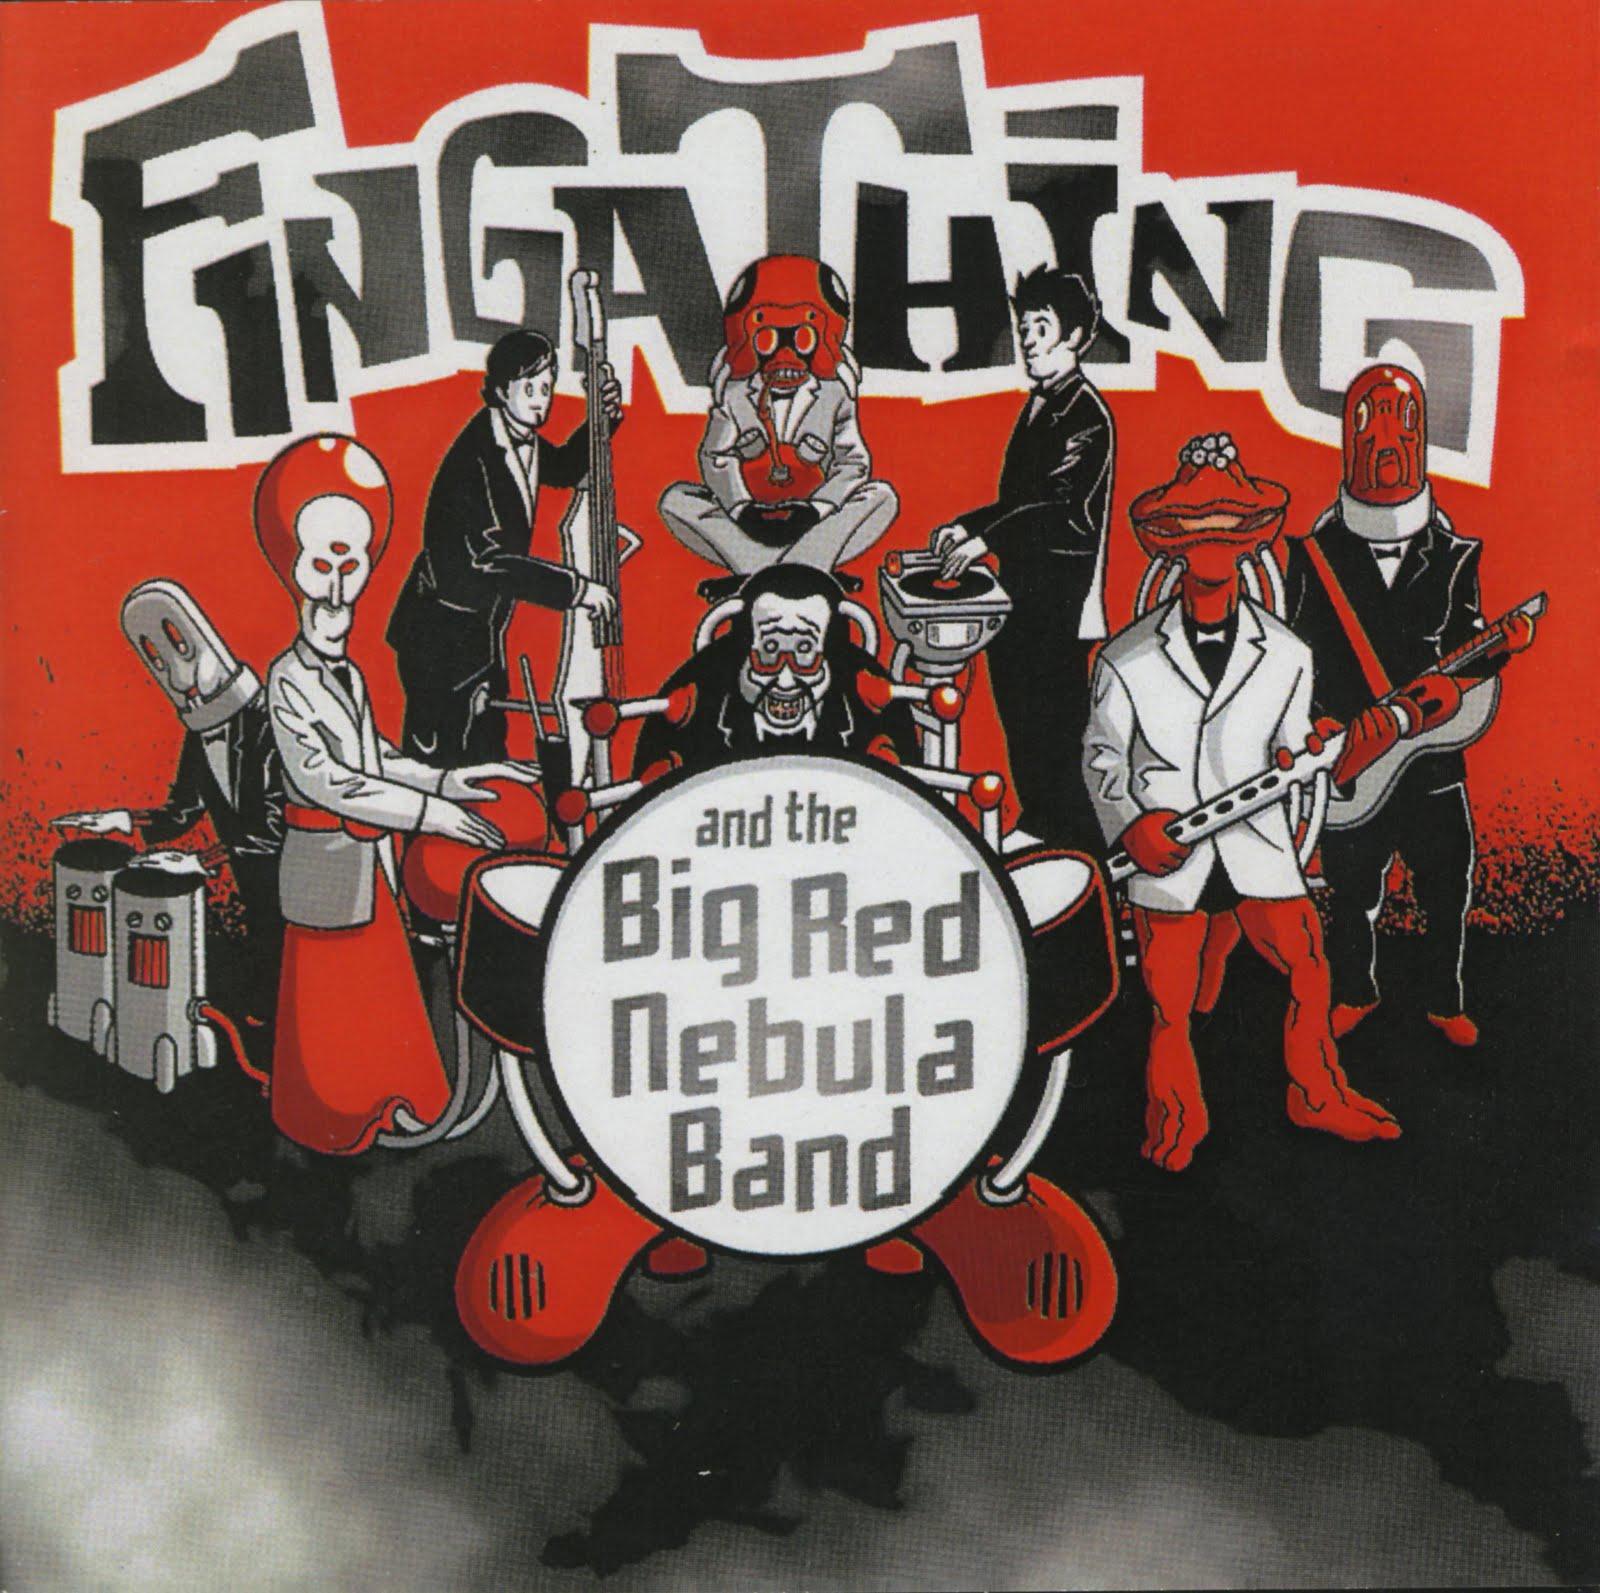 fingathing big red